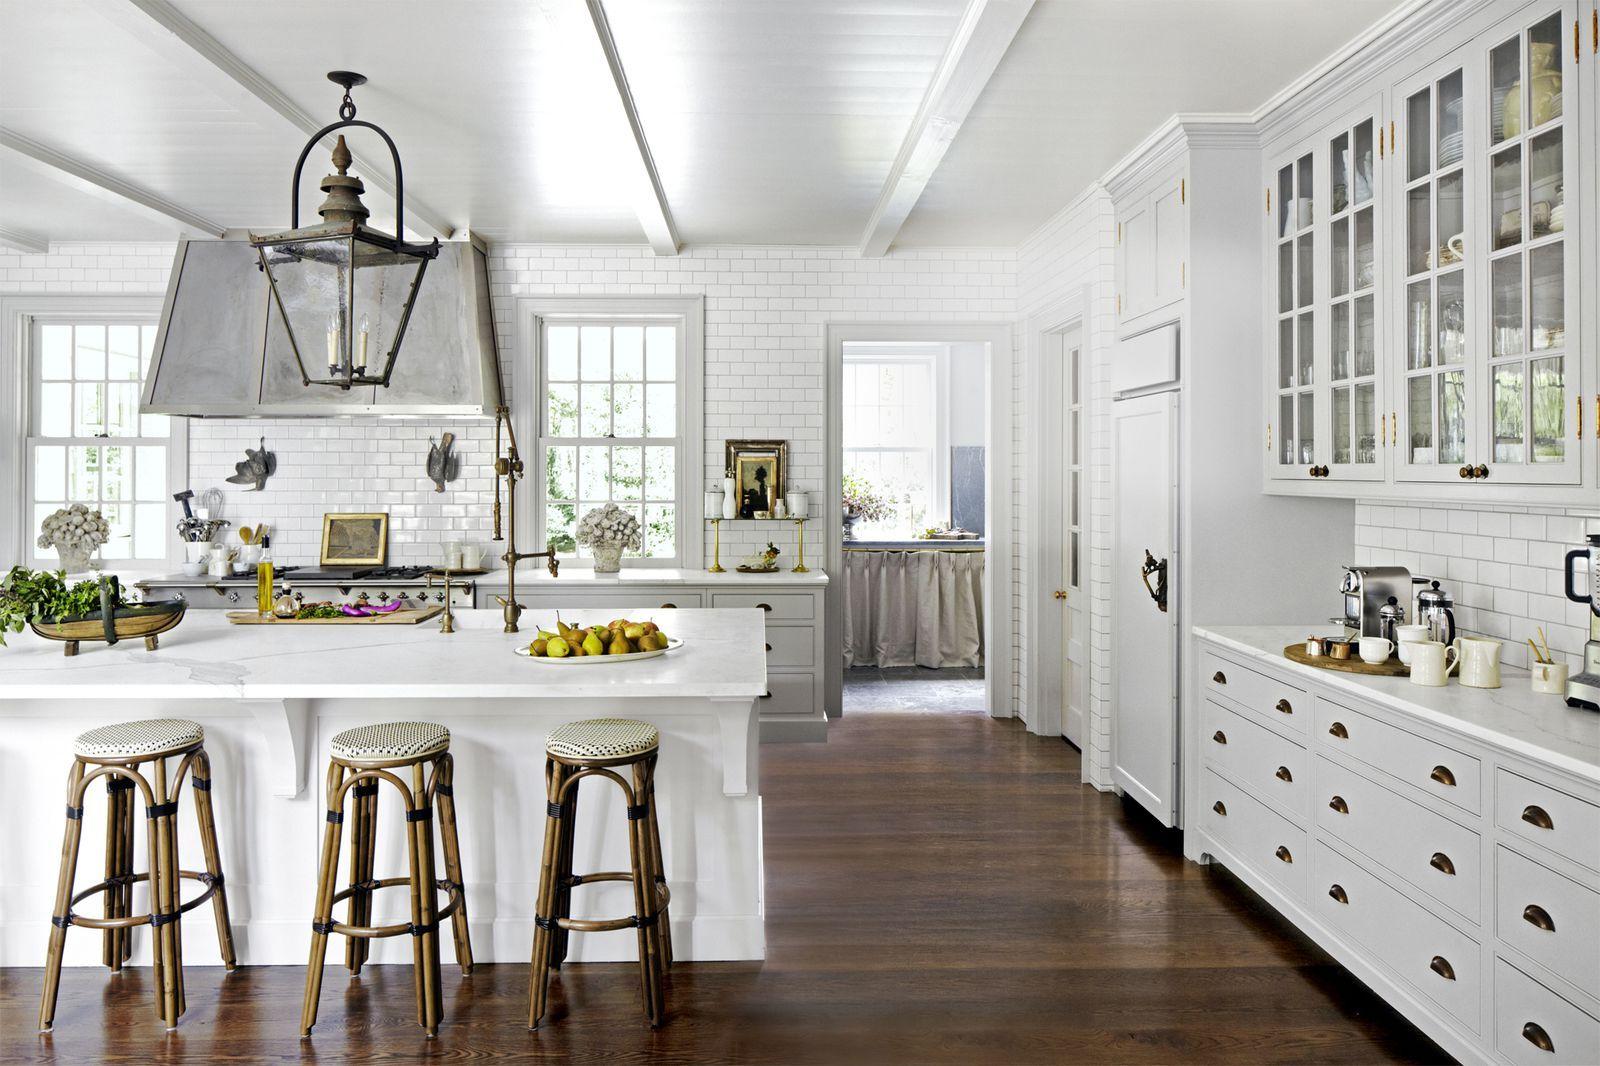 32 Kitchen Trends For 2020 That We Predict Will Be Everywhere Kitchen Inspiration Design White Kitchen Design Gorgeous Kitchens